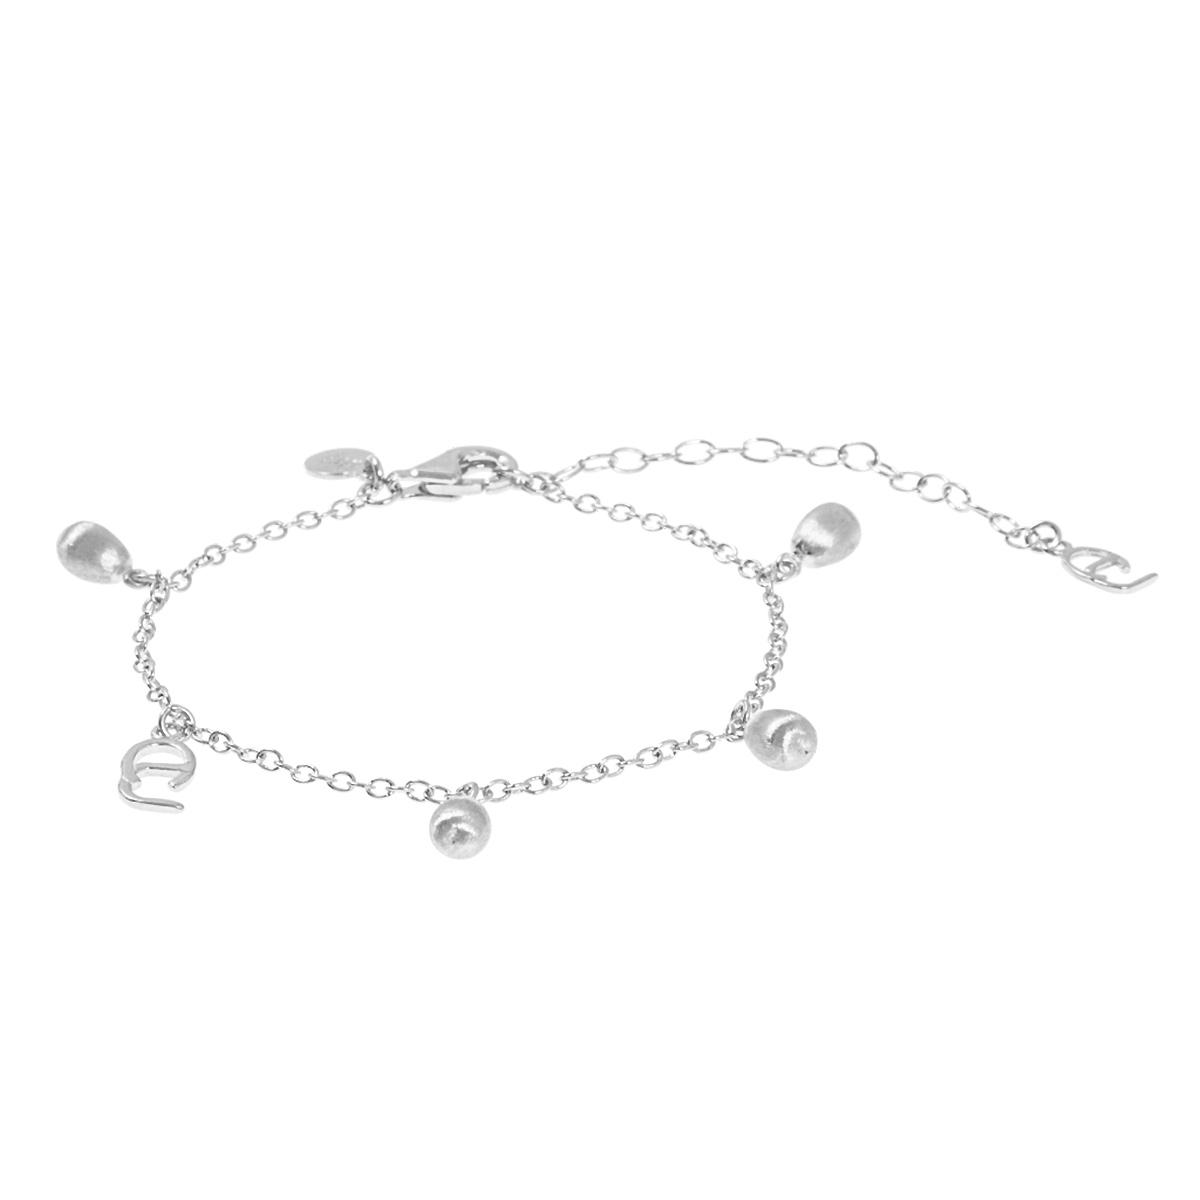 CU Jewellery – Drop Charm armband, silver